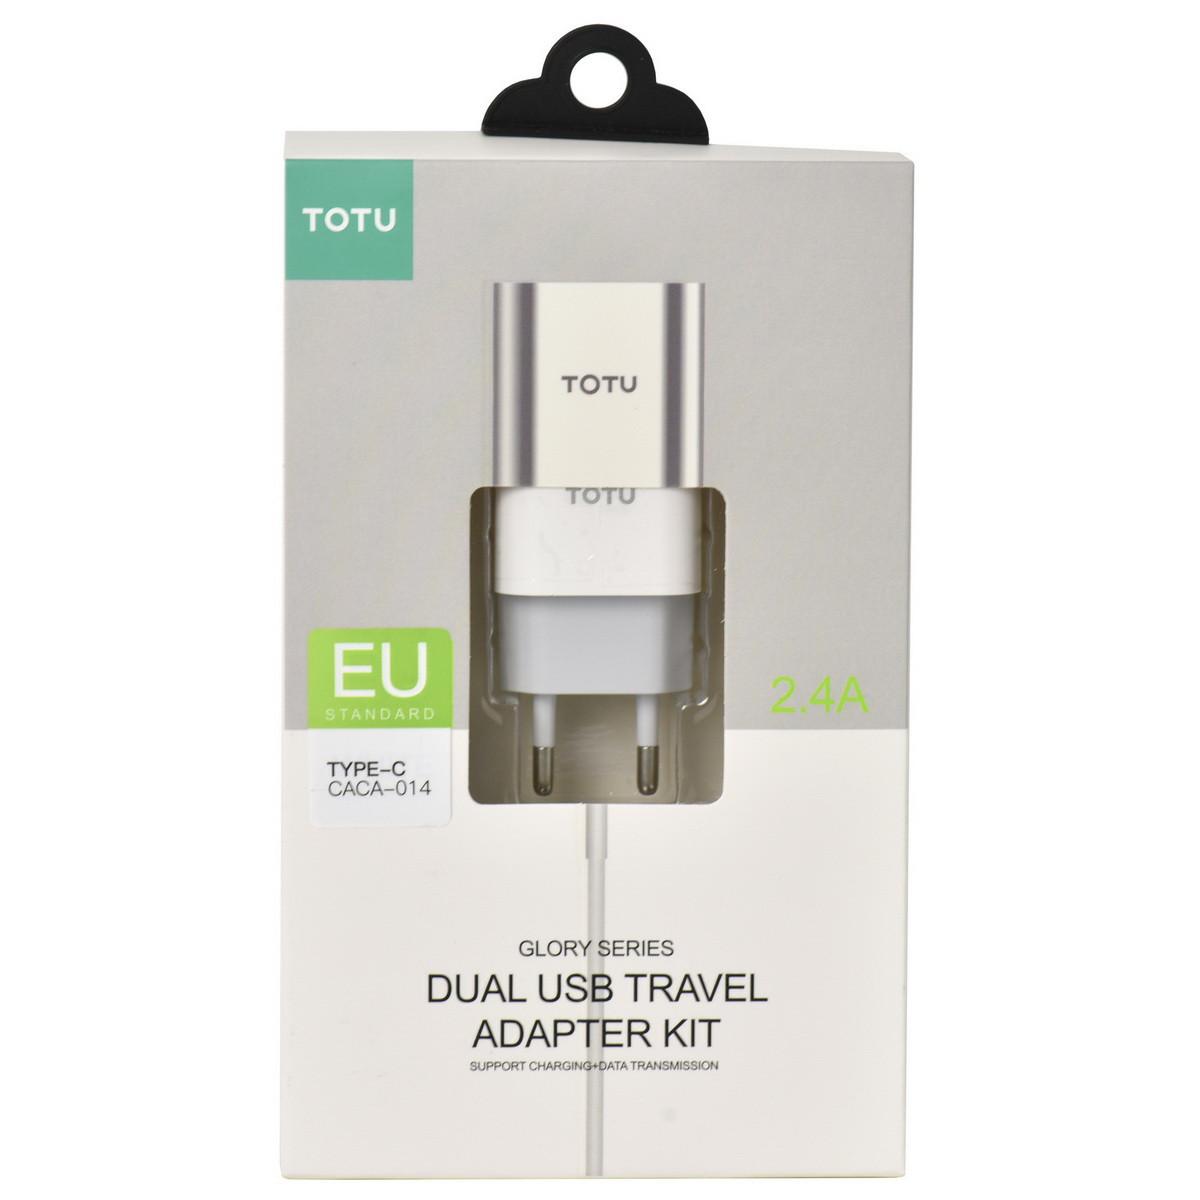 Сетевое зарядное устройство Totu Glory Series CACA-014 2XUSB 2.4A с кабелем Type-C White